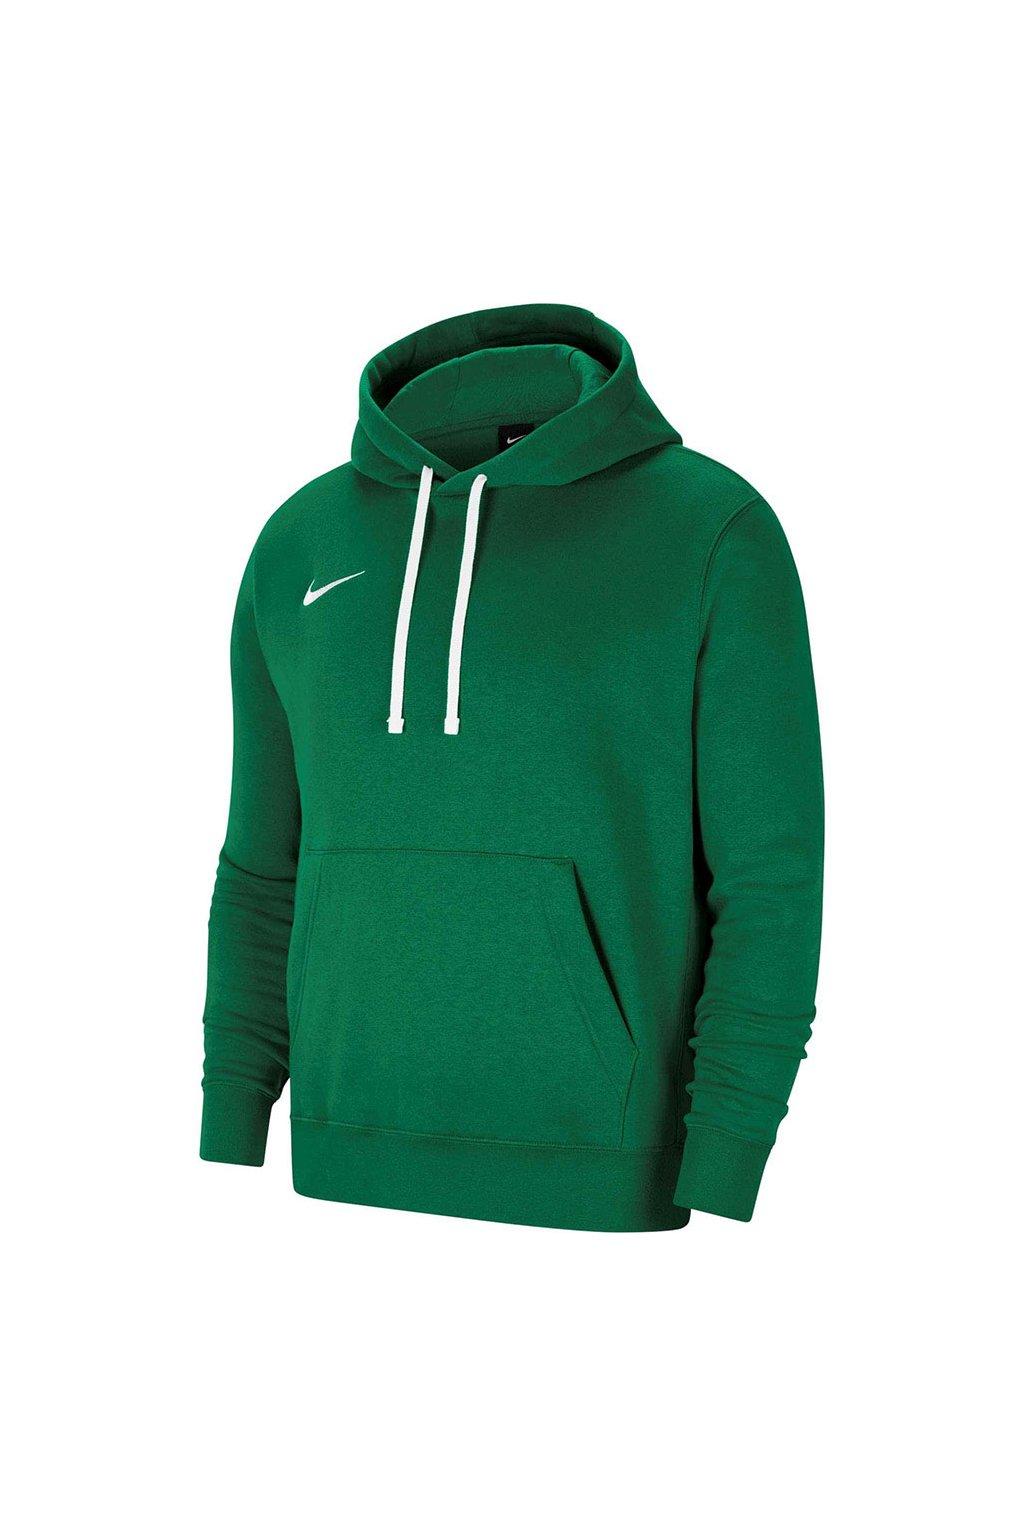 Dámska mikina Nike Park 20 Hoodie zelená CW6957 302